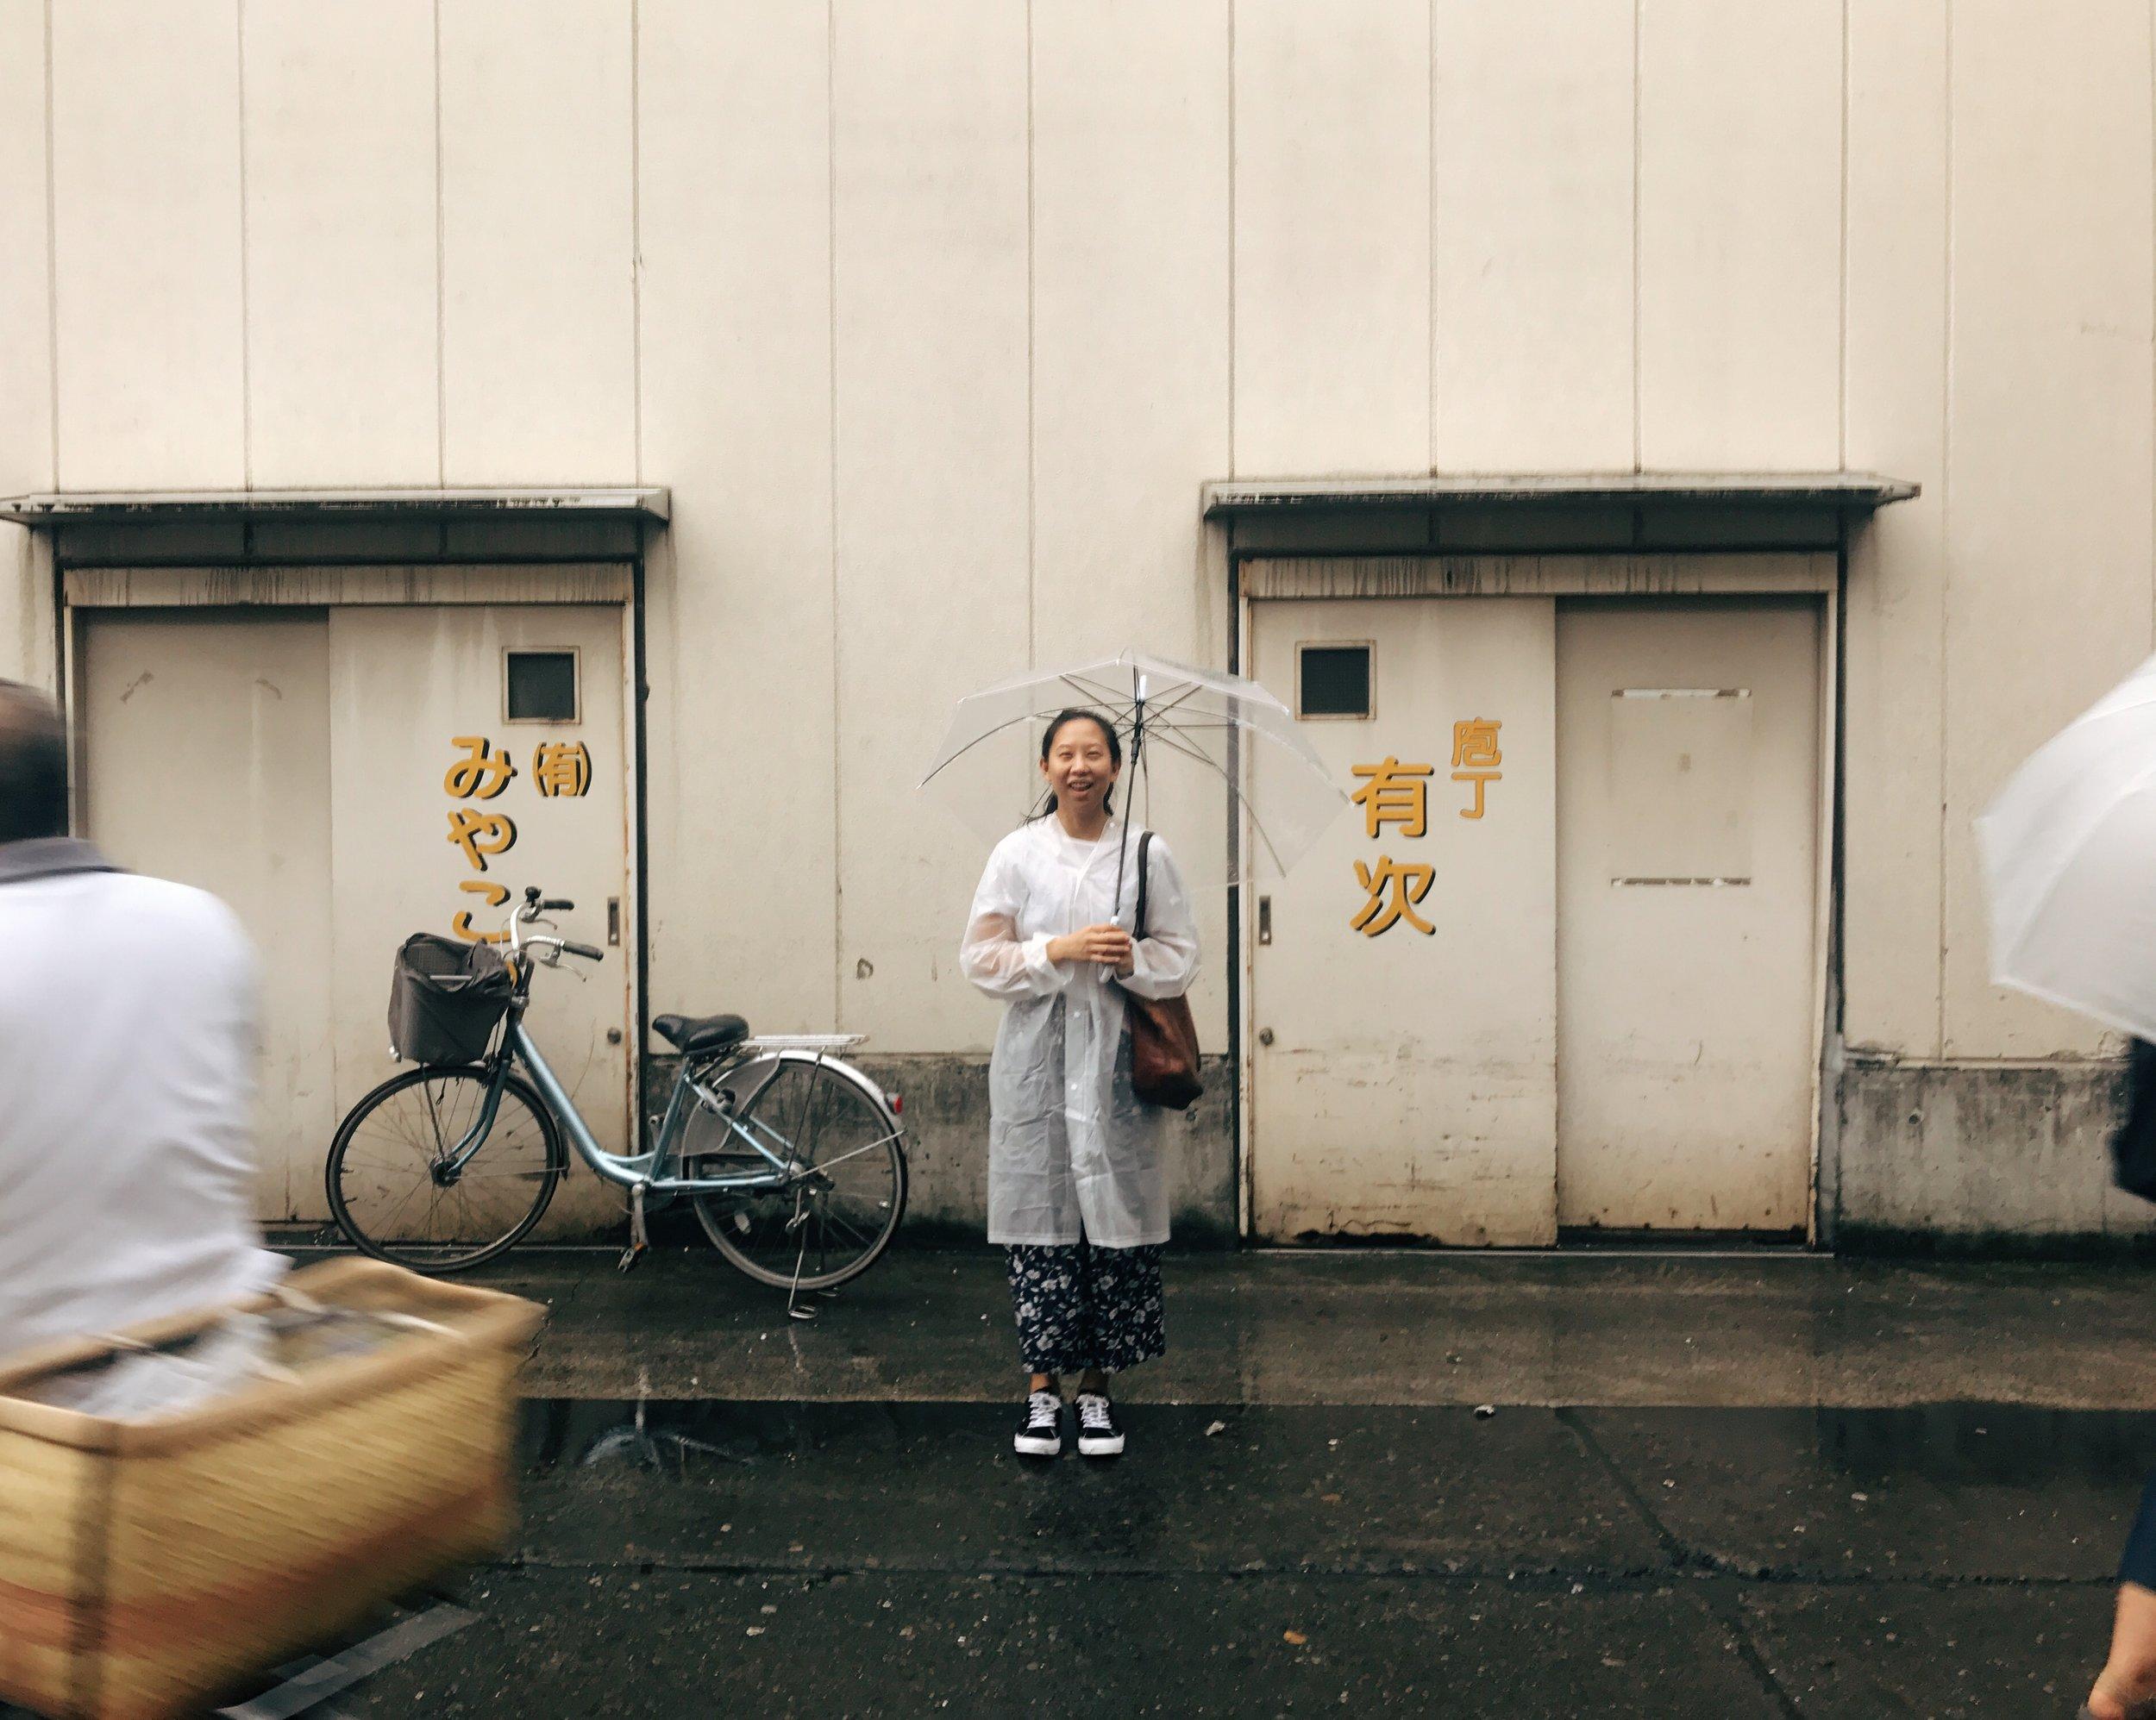 Me in the rain at the Tsukiji fish market in Tokyo.